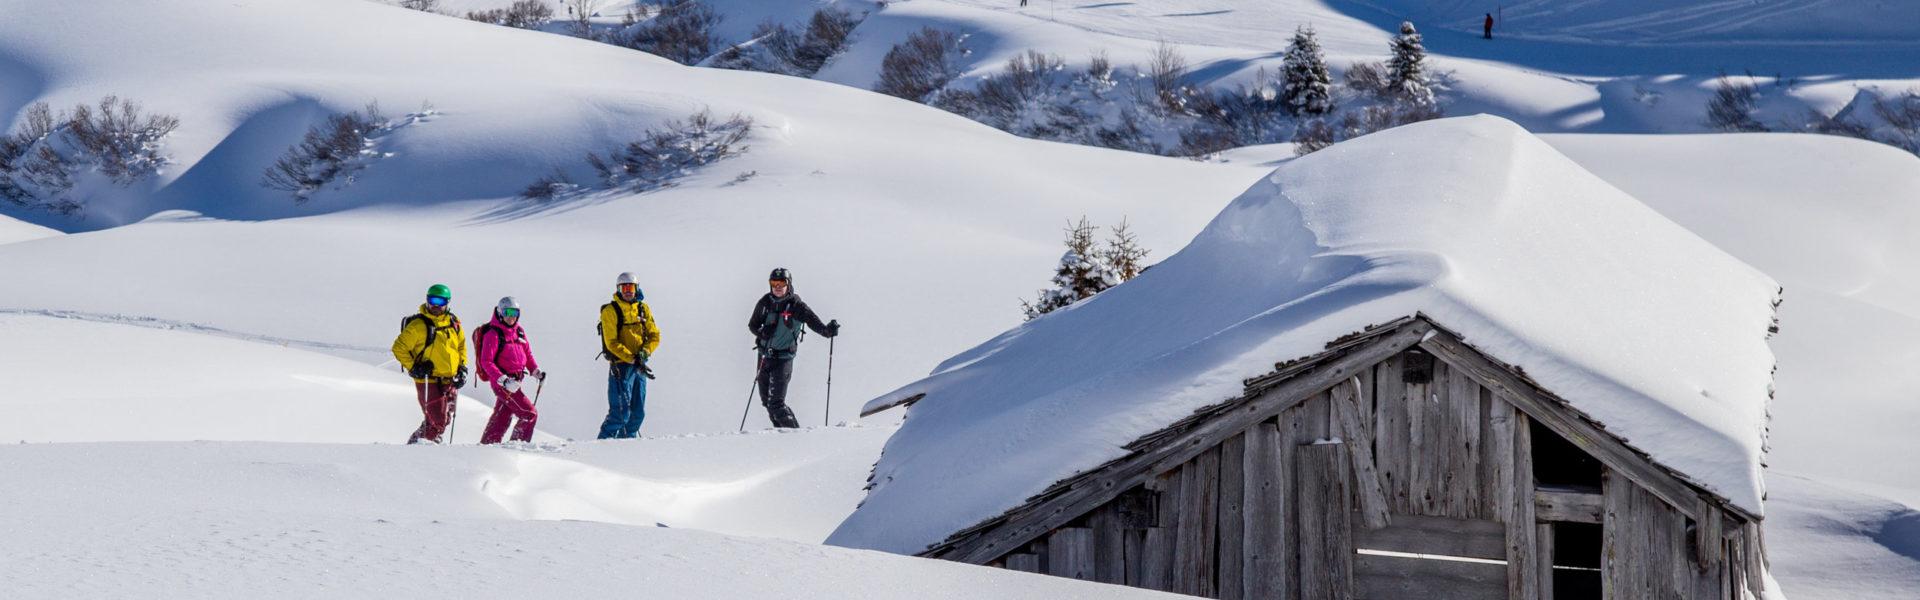 Freeriden in Lech am Arlberg © Gijs Hardeman / Vorarlberg Tourismus GmbH